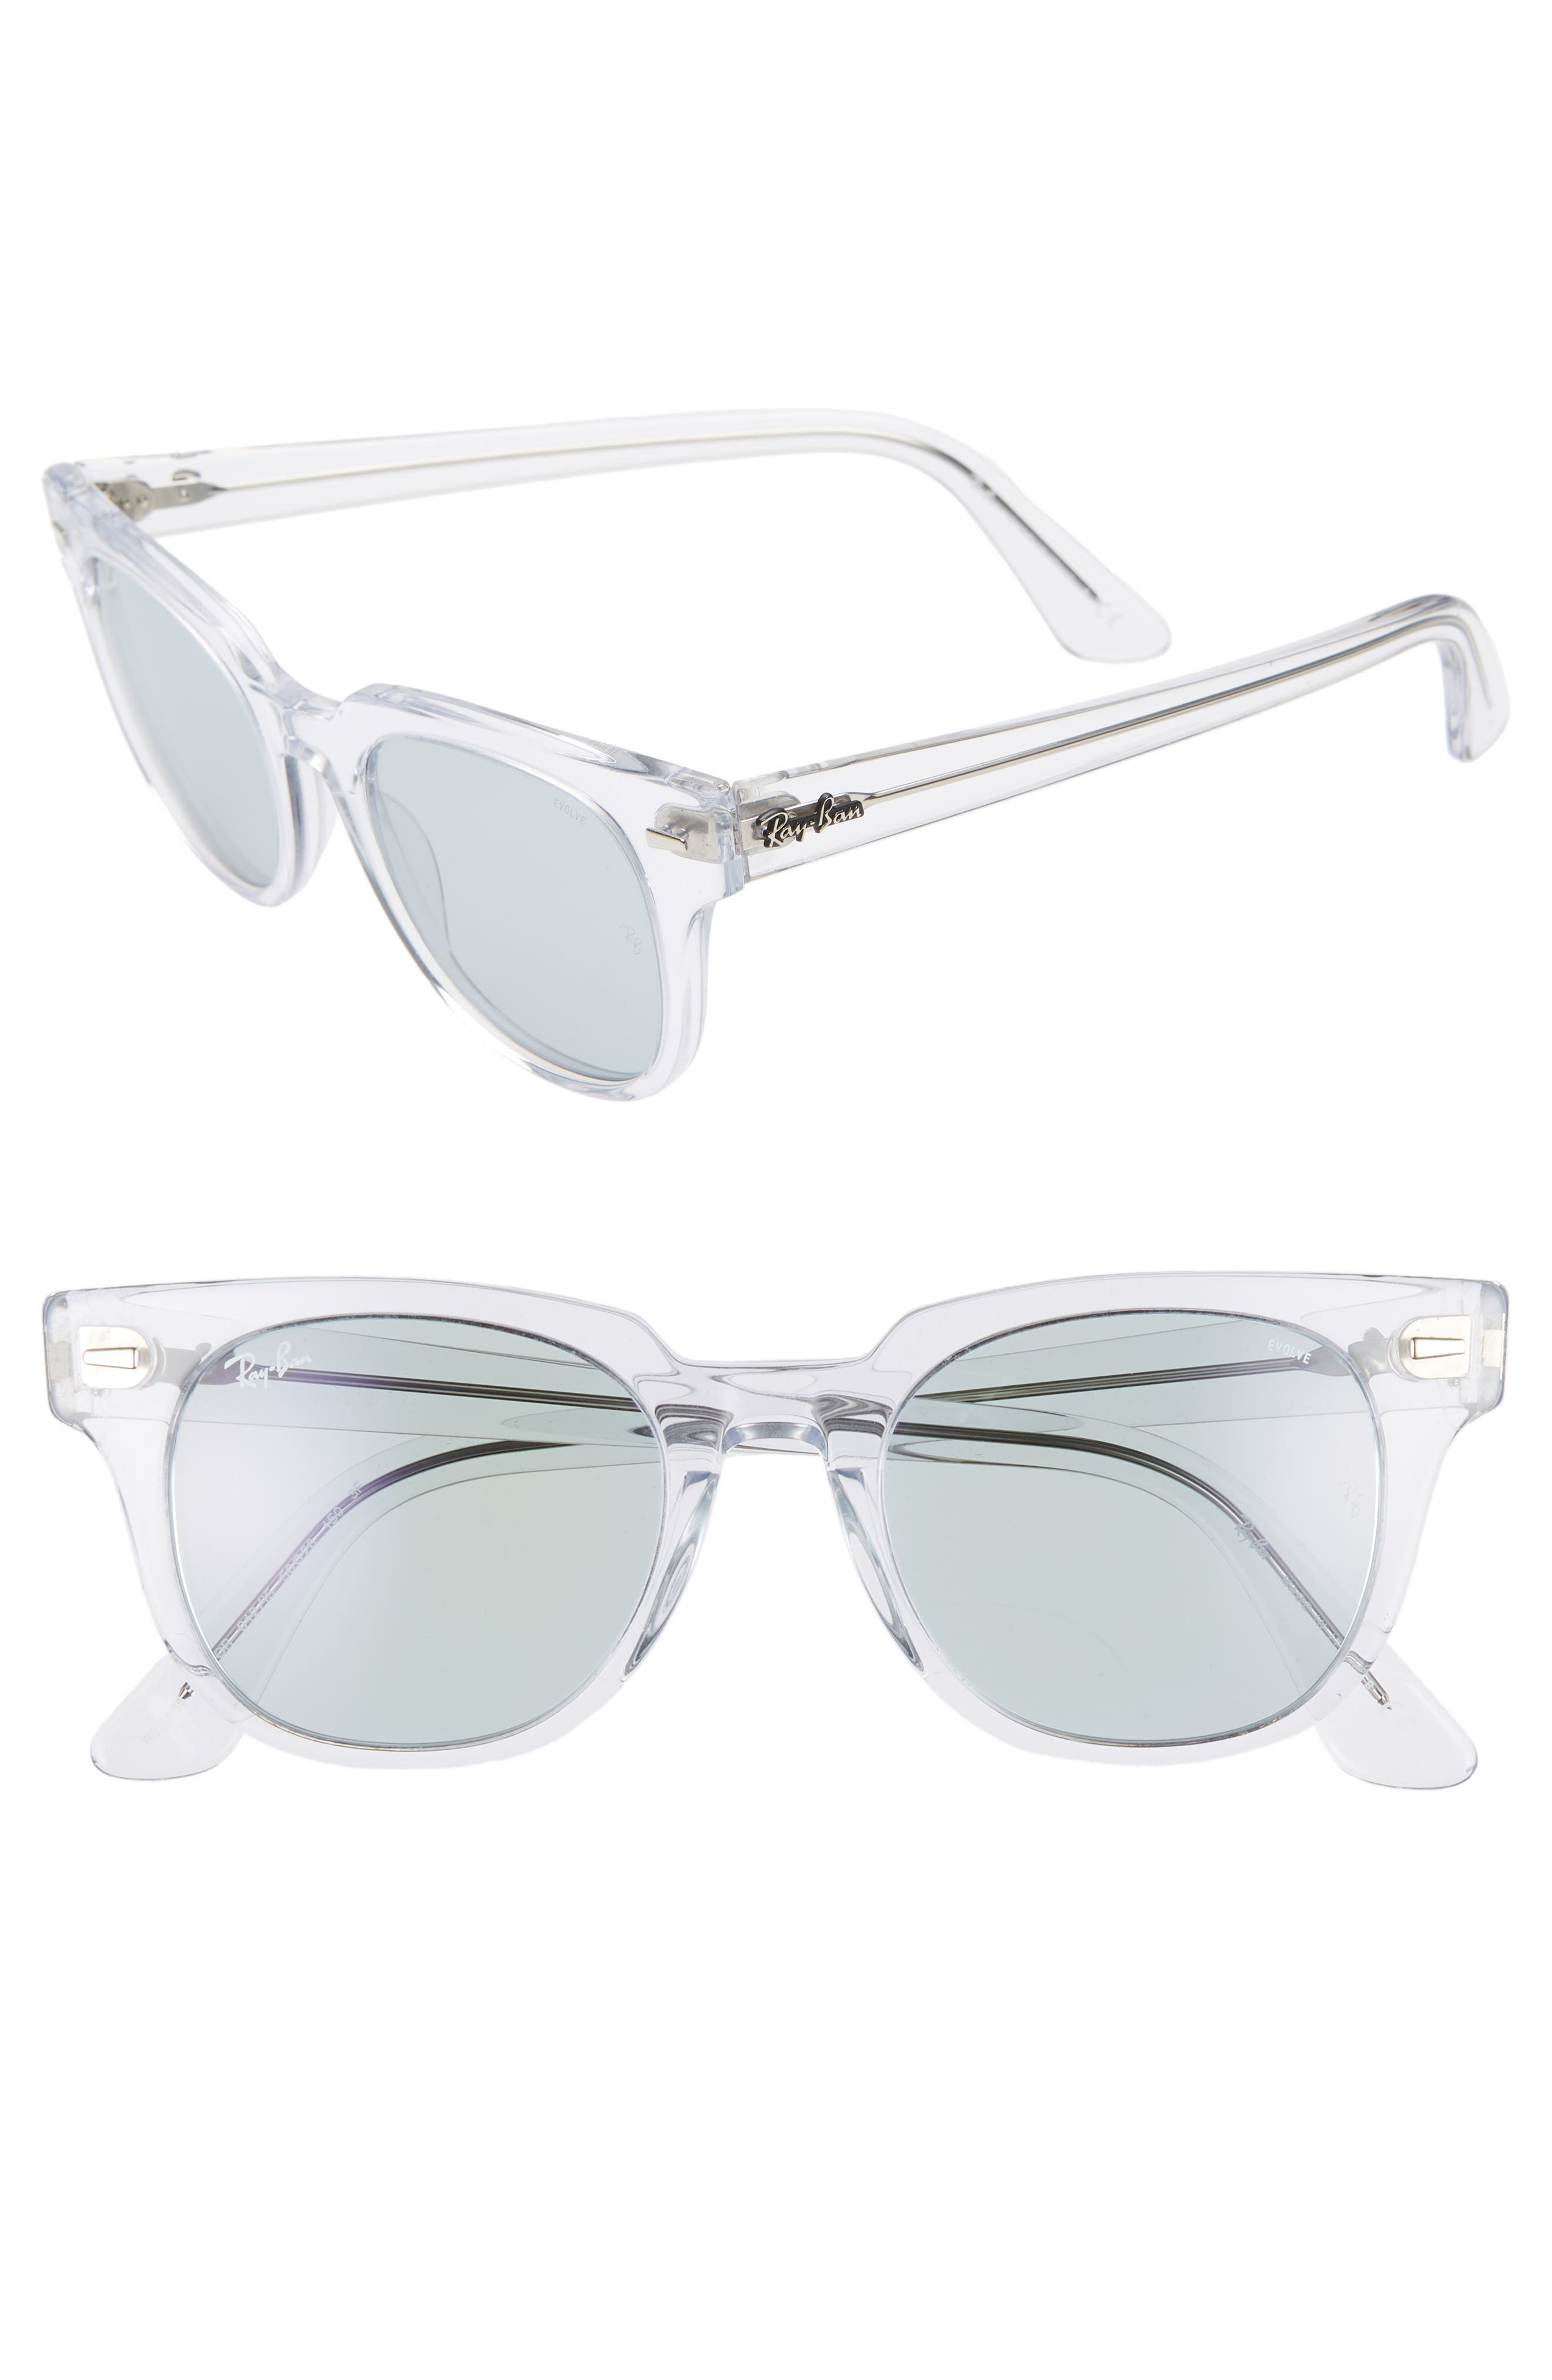 RAY-BAN Meteor 50mm Wayfarer Photochromic Sunglasses, Main, color, CRYSTAL/ BLUE SOLID